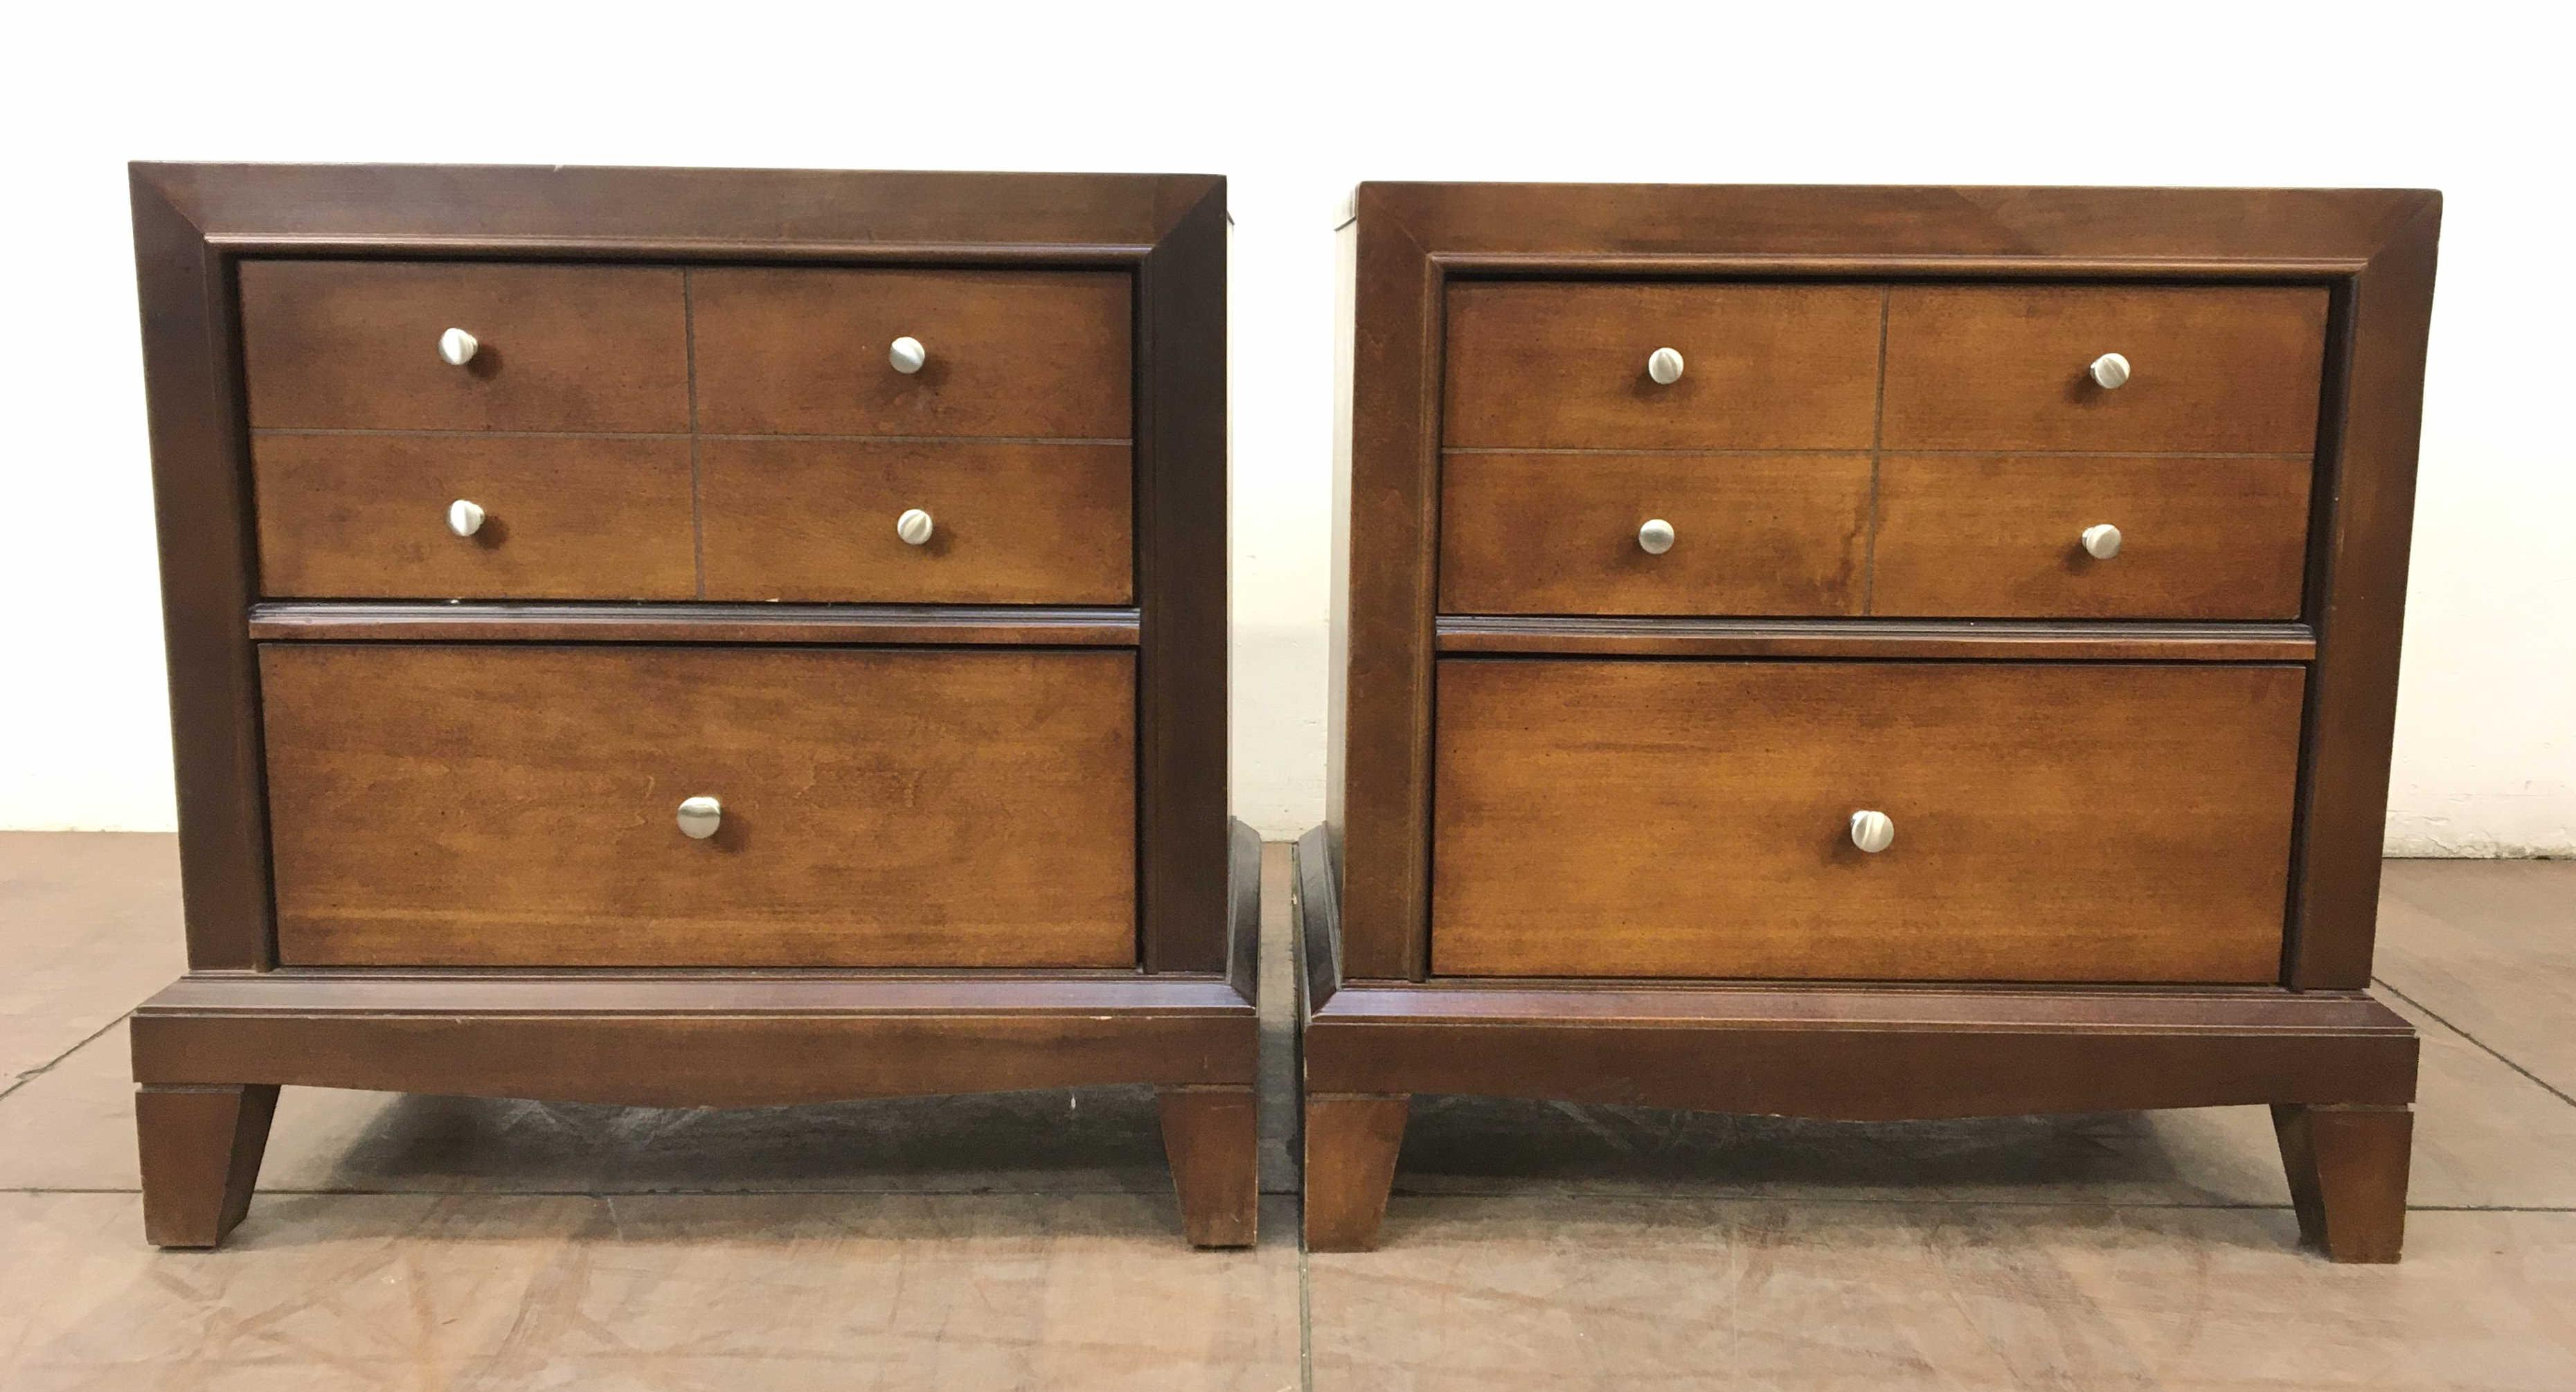 Bassett Furniture Transitional Style Nightstands